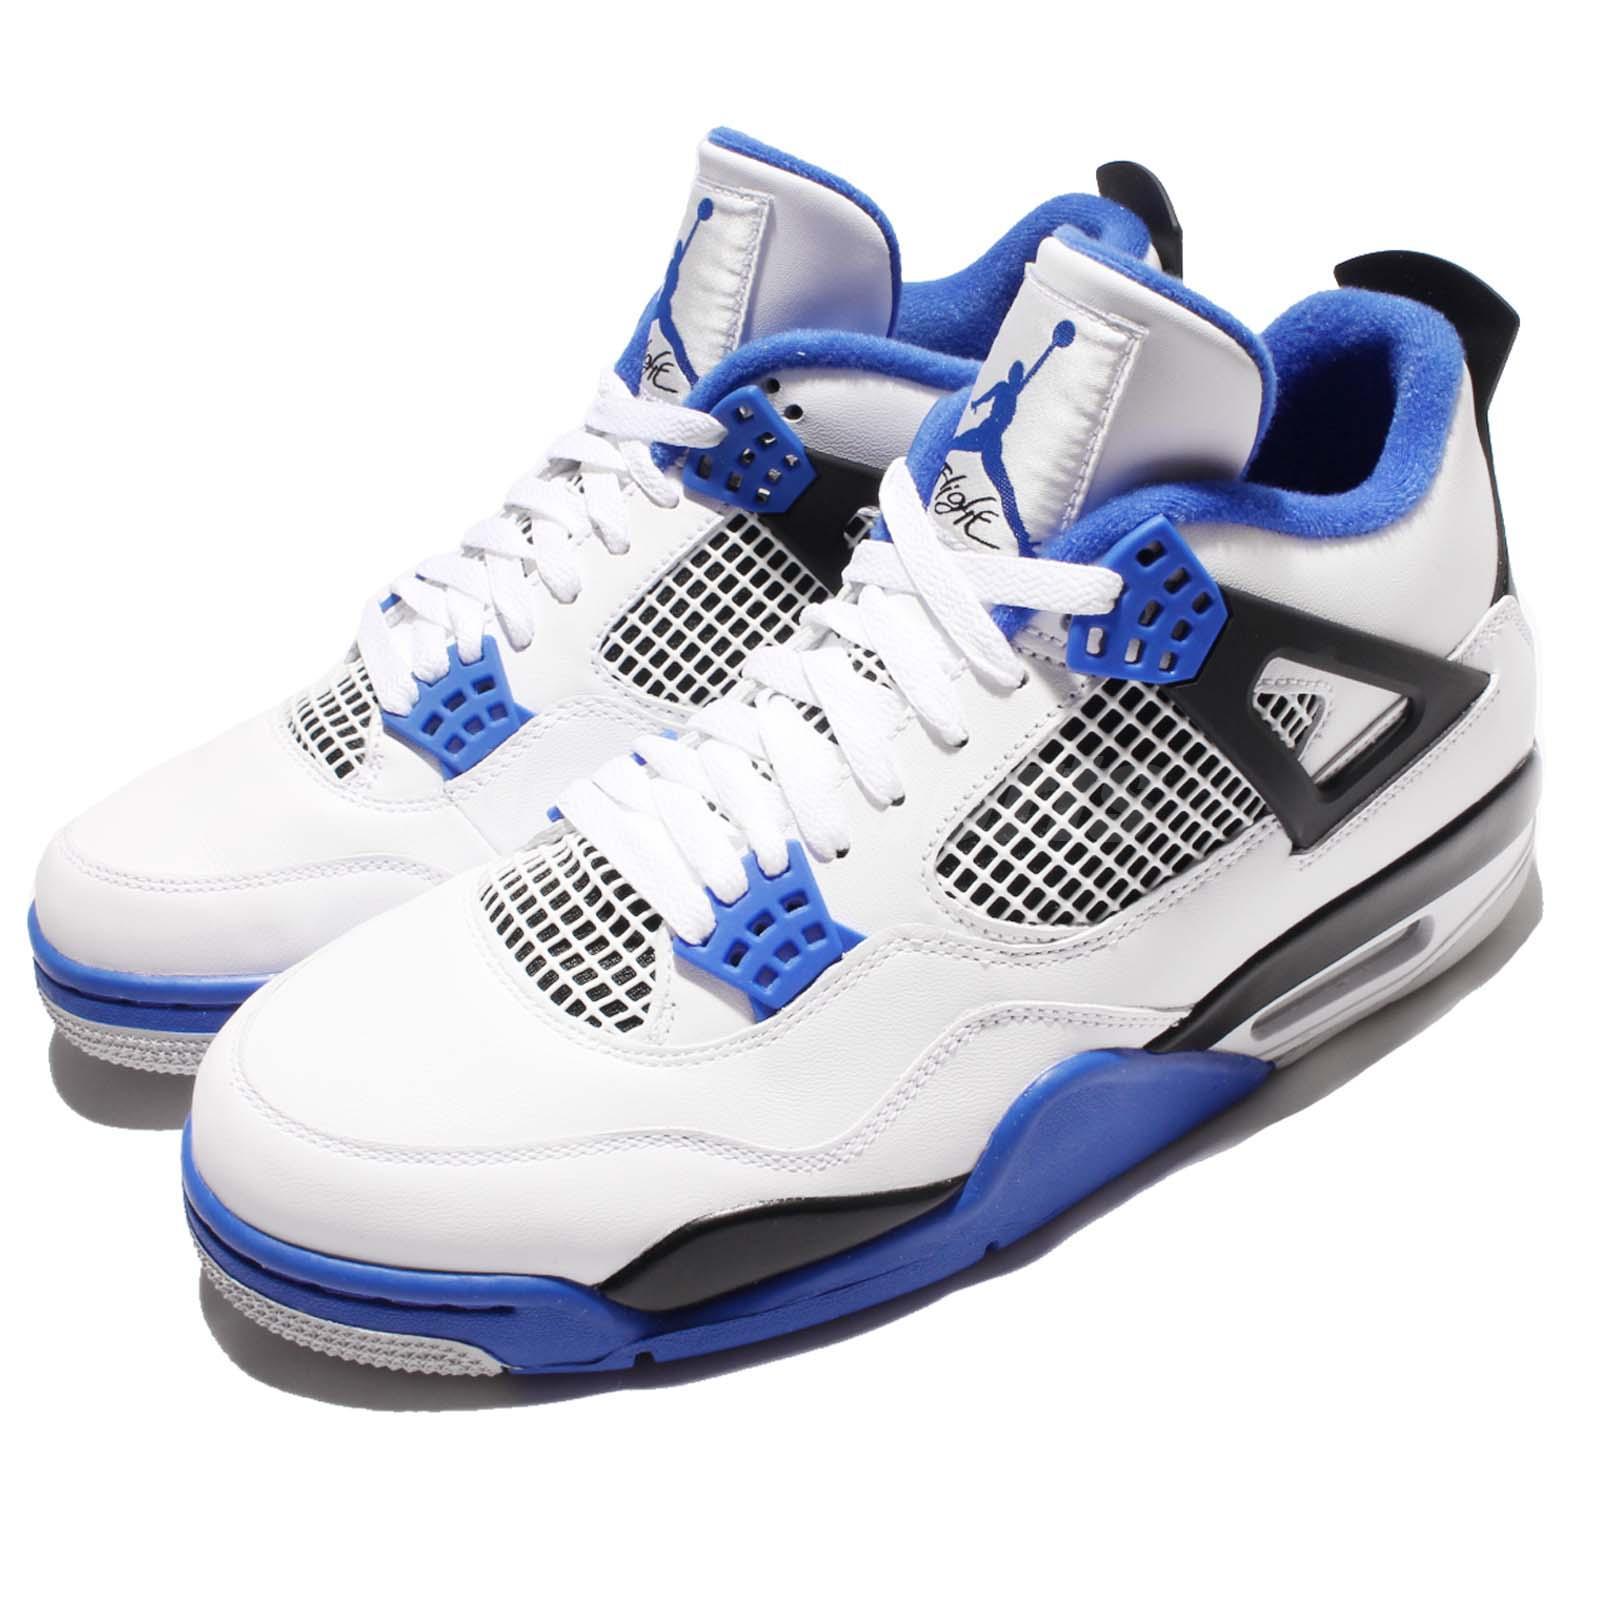 Nike Air Jordan Shoe Size Chart